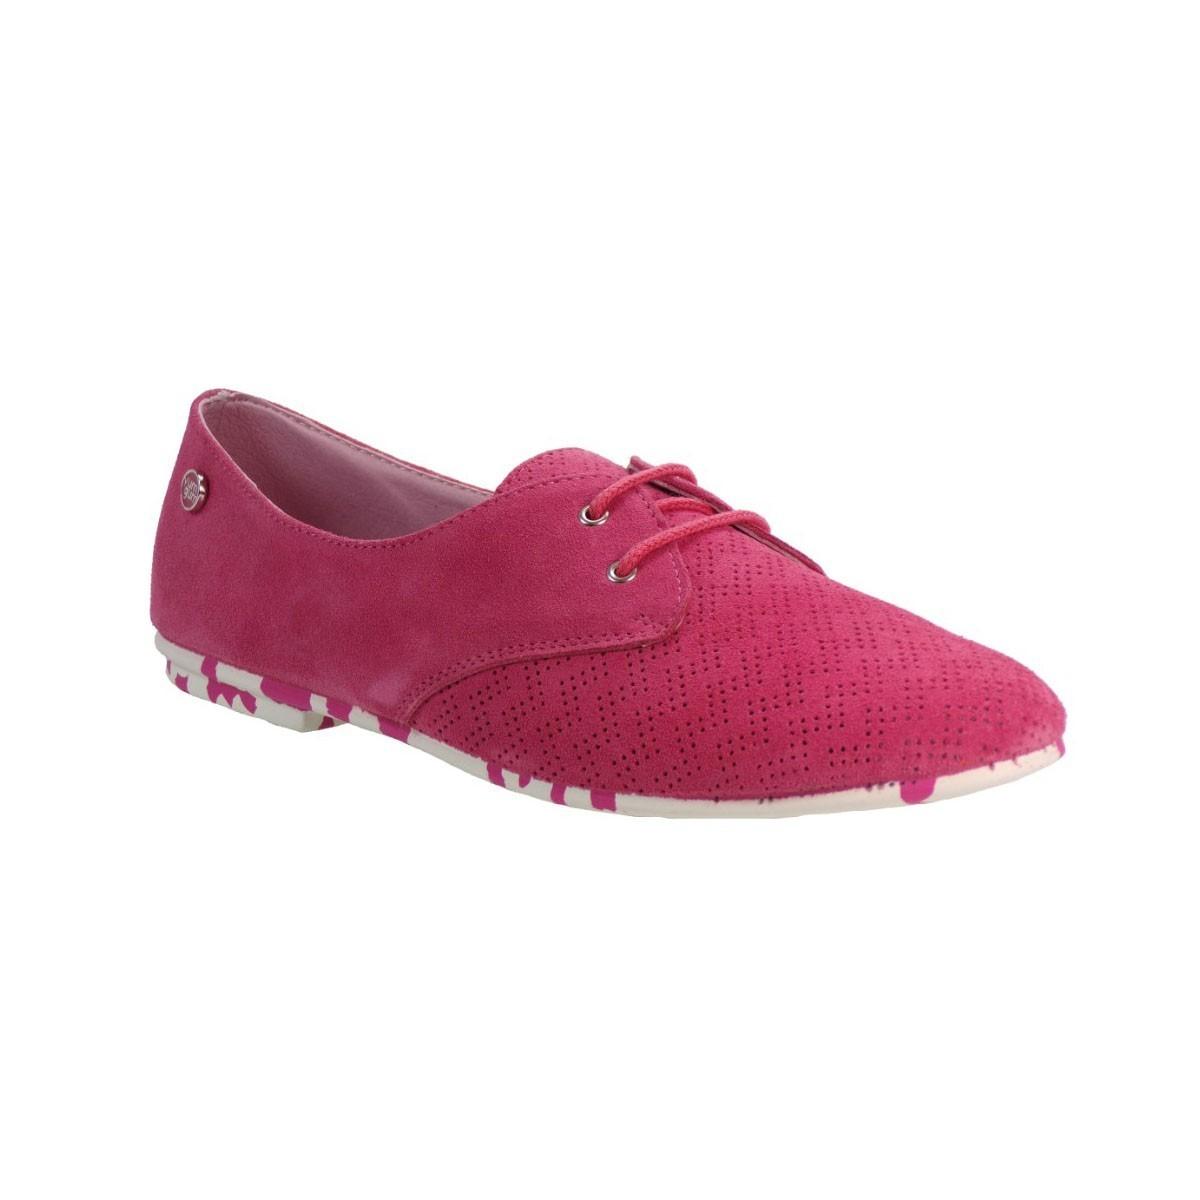 yum gum Γυναικεία Παπούτσια Derby Tove 17SW605/26 Κοραλί yum gum Derby Tove 17SW605/26 Κοραλί